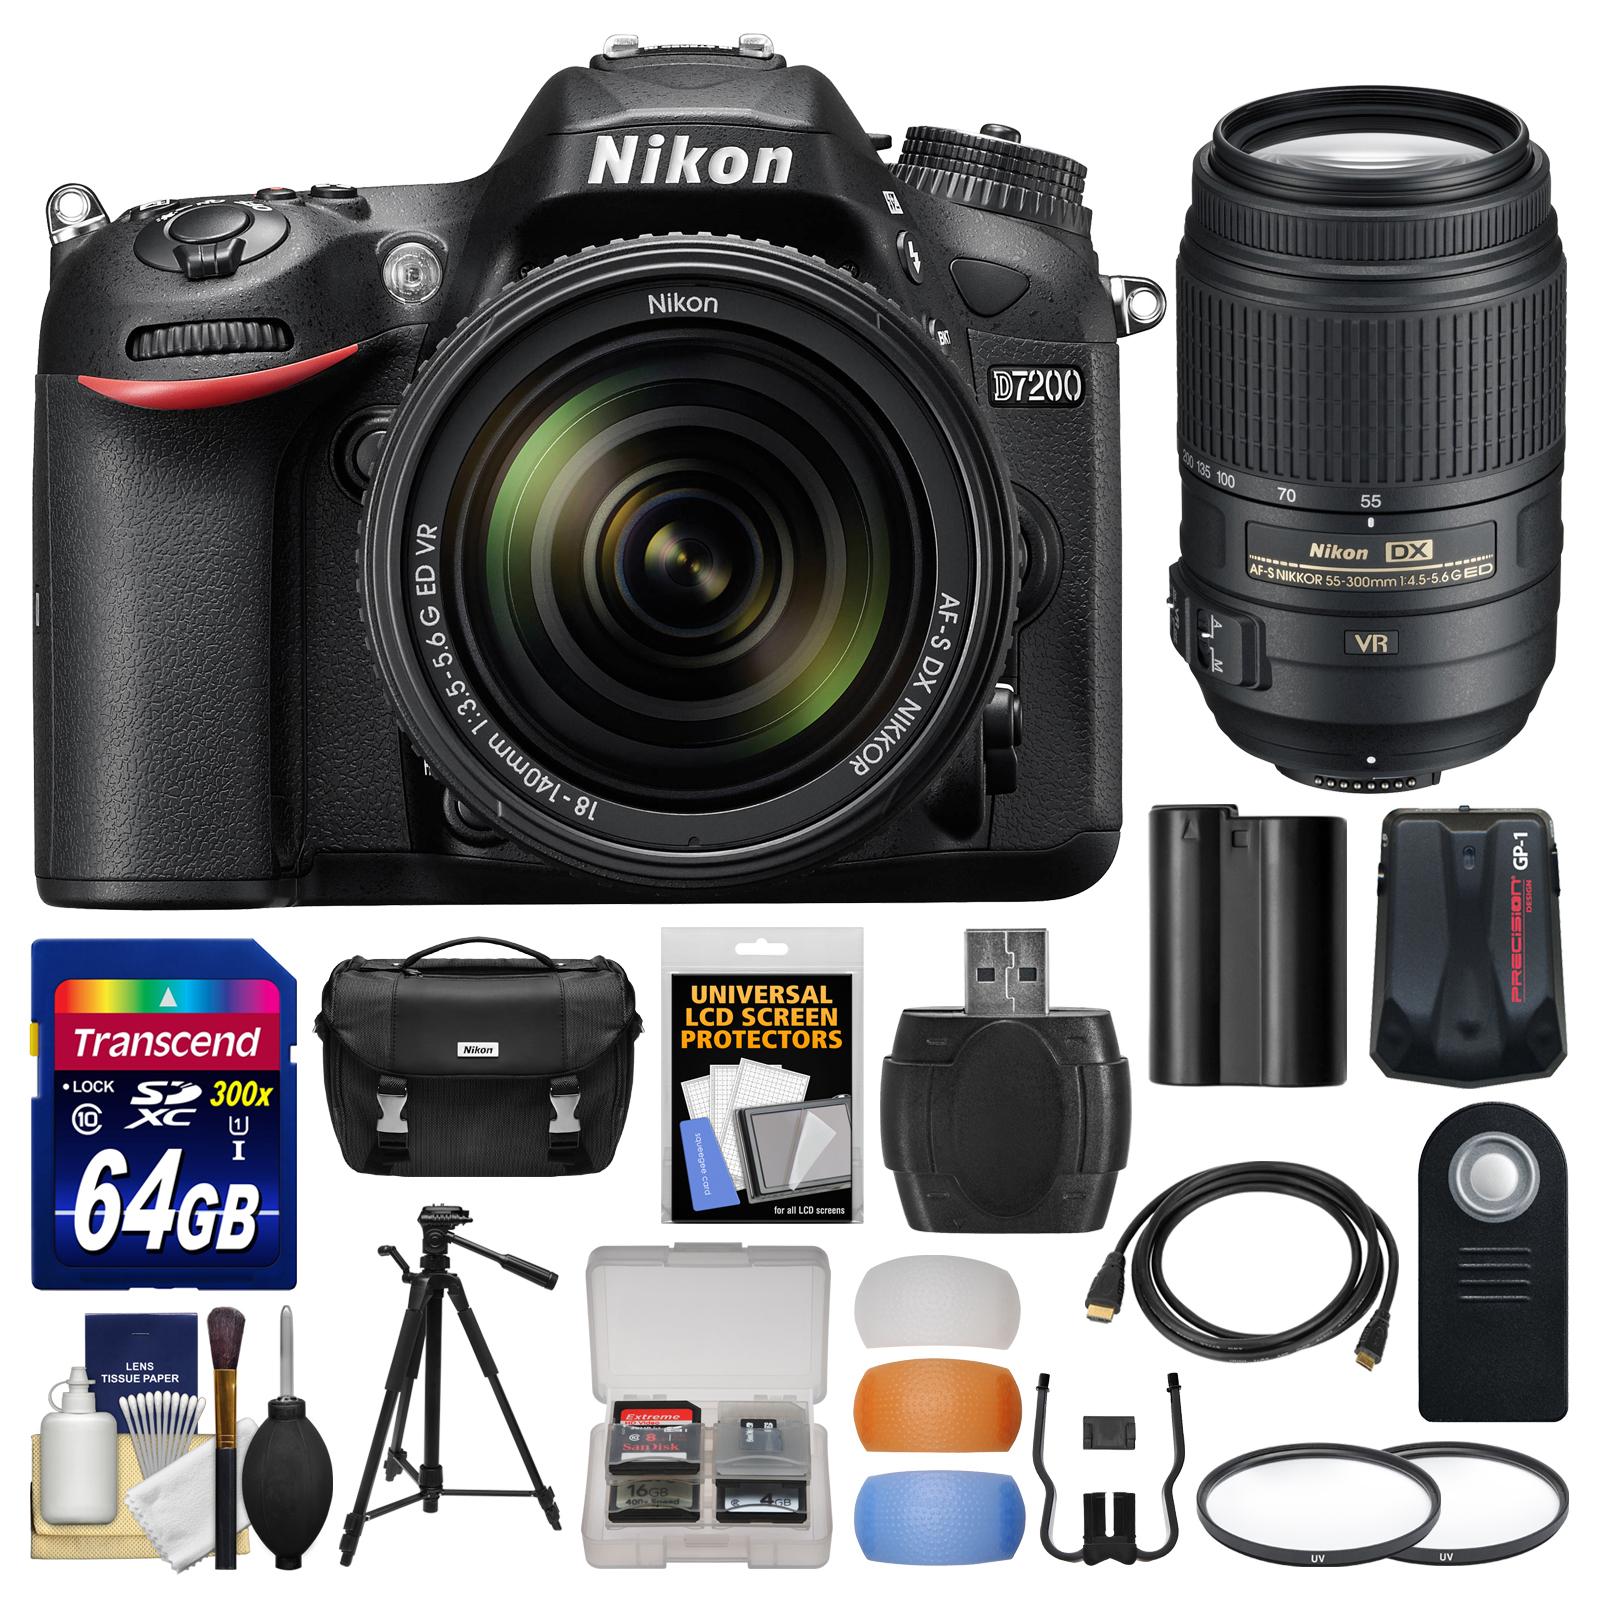 Nikon D7200 Wi-Fi Digital SLR Camera & 18-140mm VR DX & 55-300mm VR Lens with 64GB Card + Case + Battery +... by Nikon